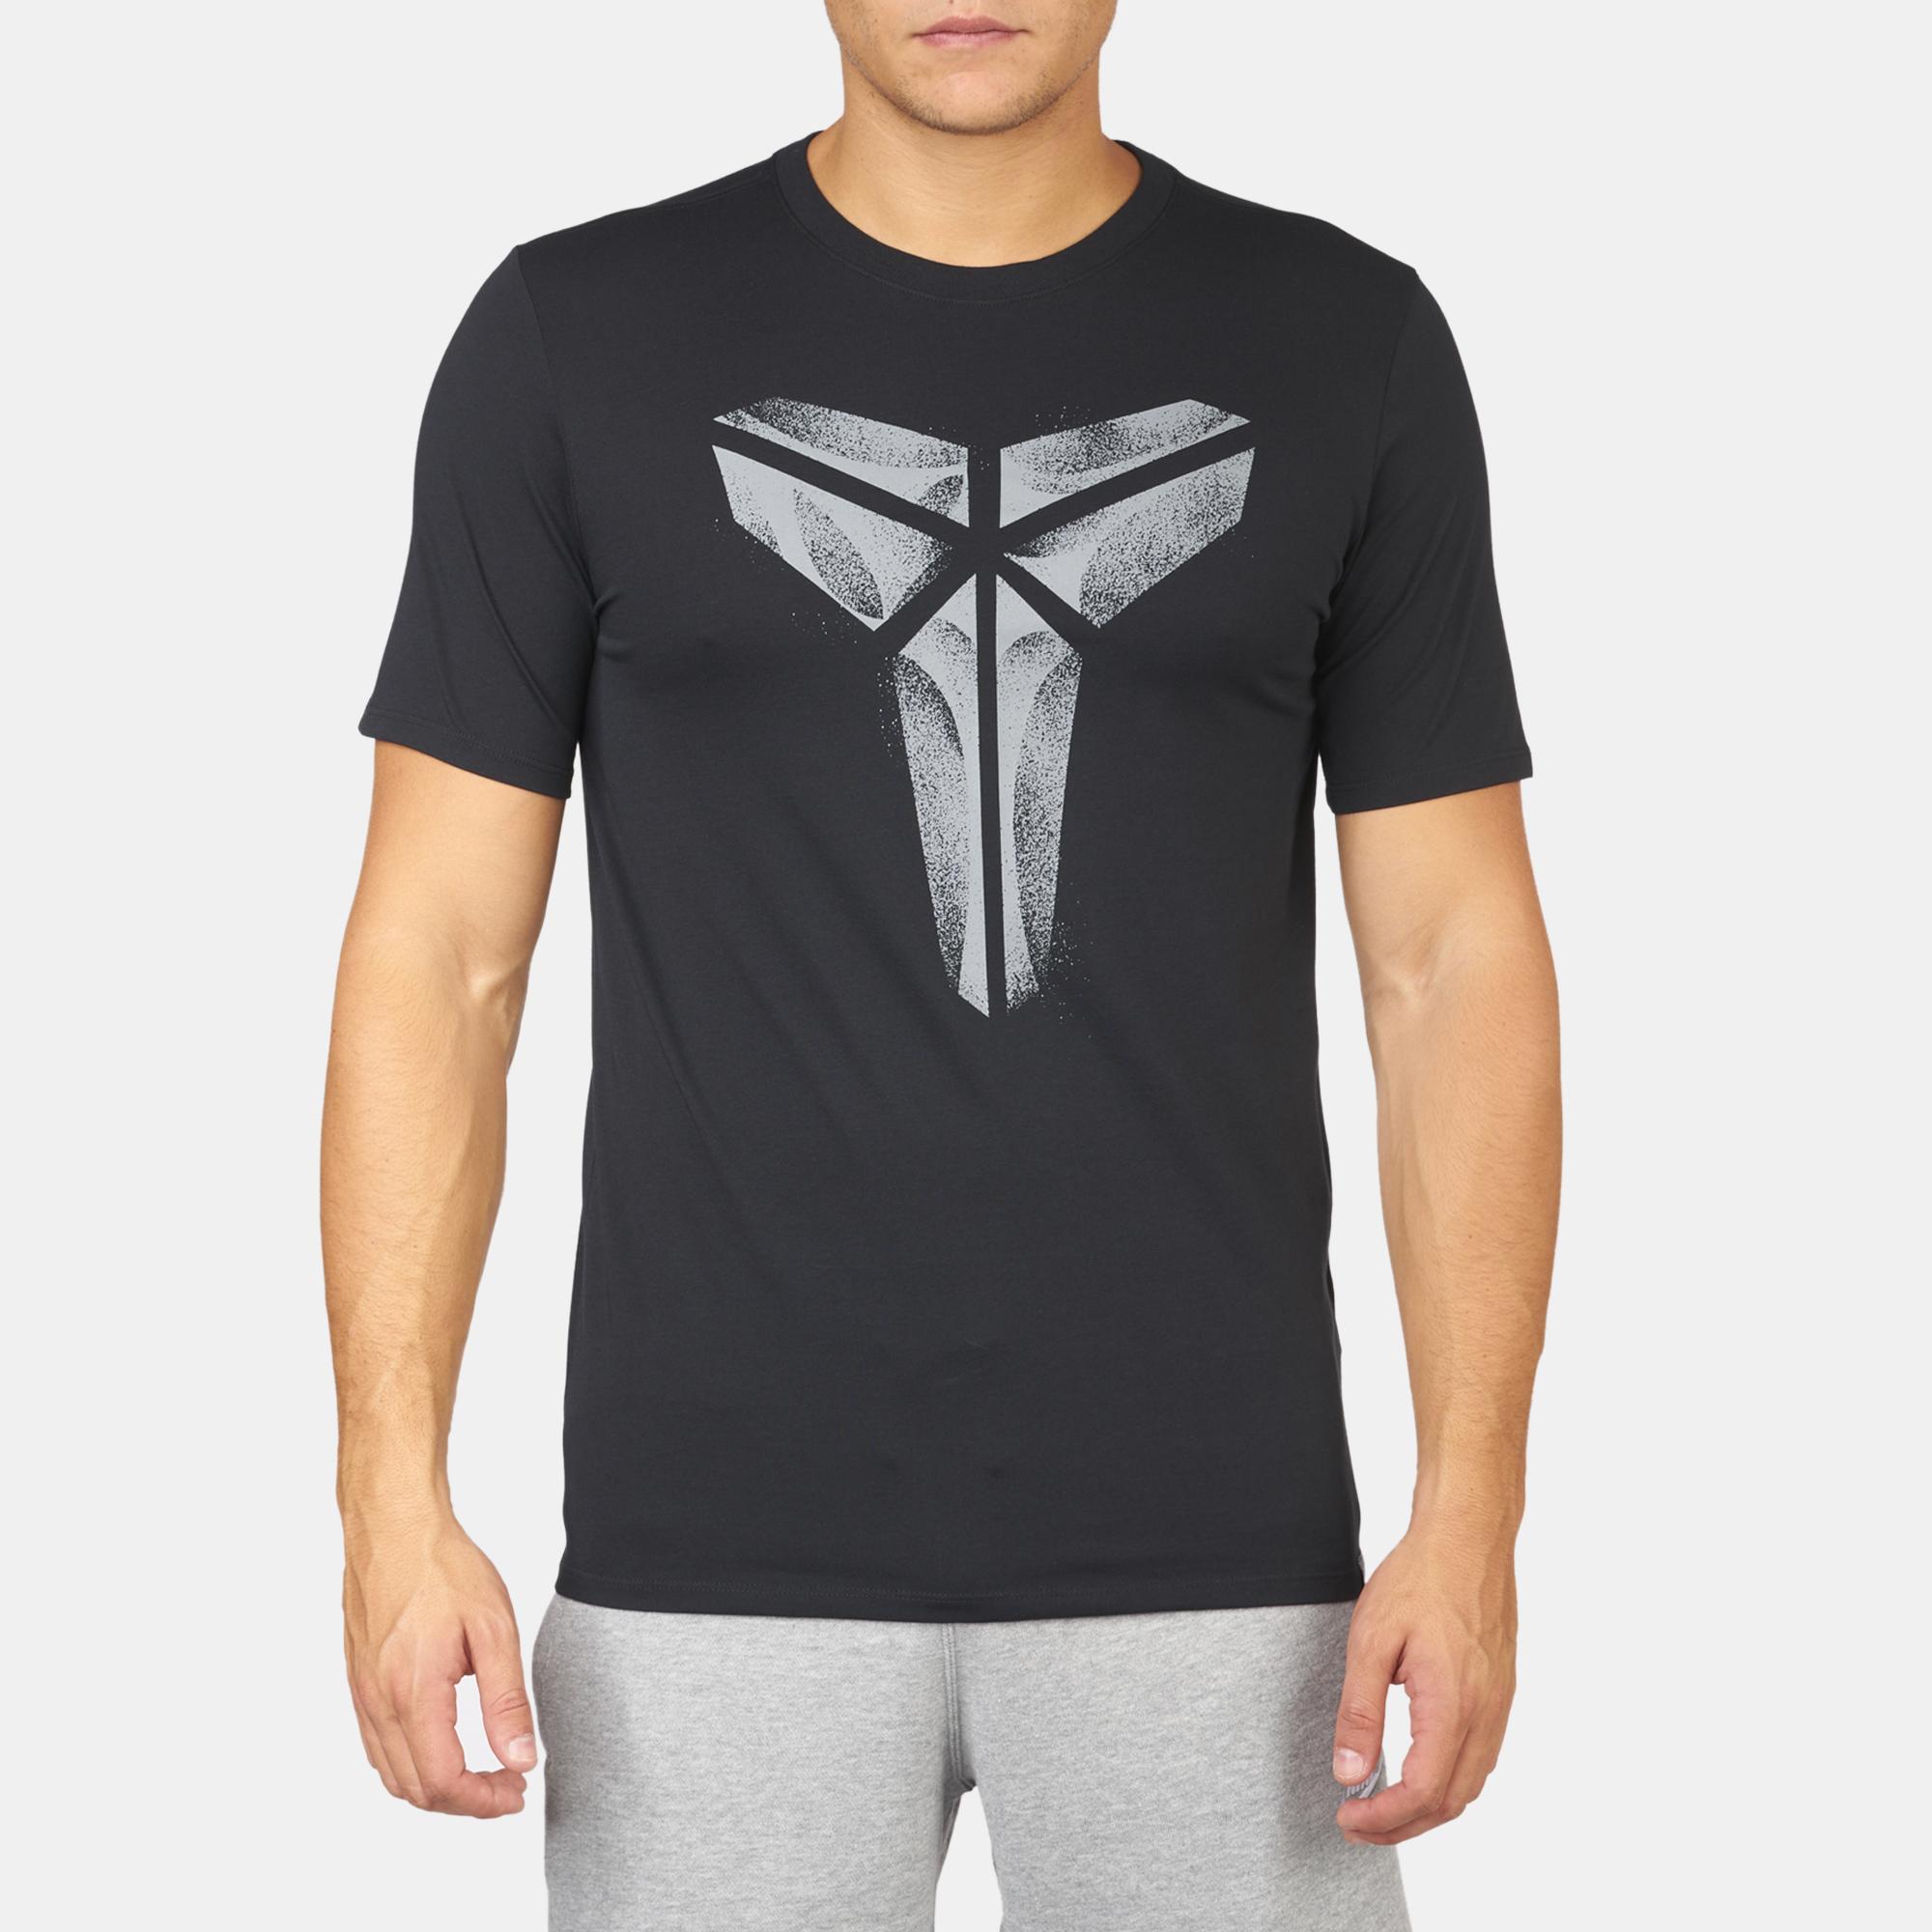 Kobe Bryant Backpacks >> Shop Black Nike Kobe XXIV Basketball T-Shirt for Mens by Nike | SSS